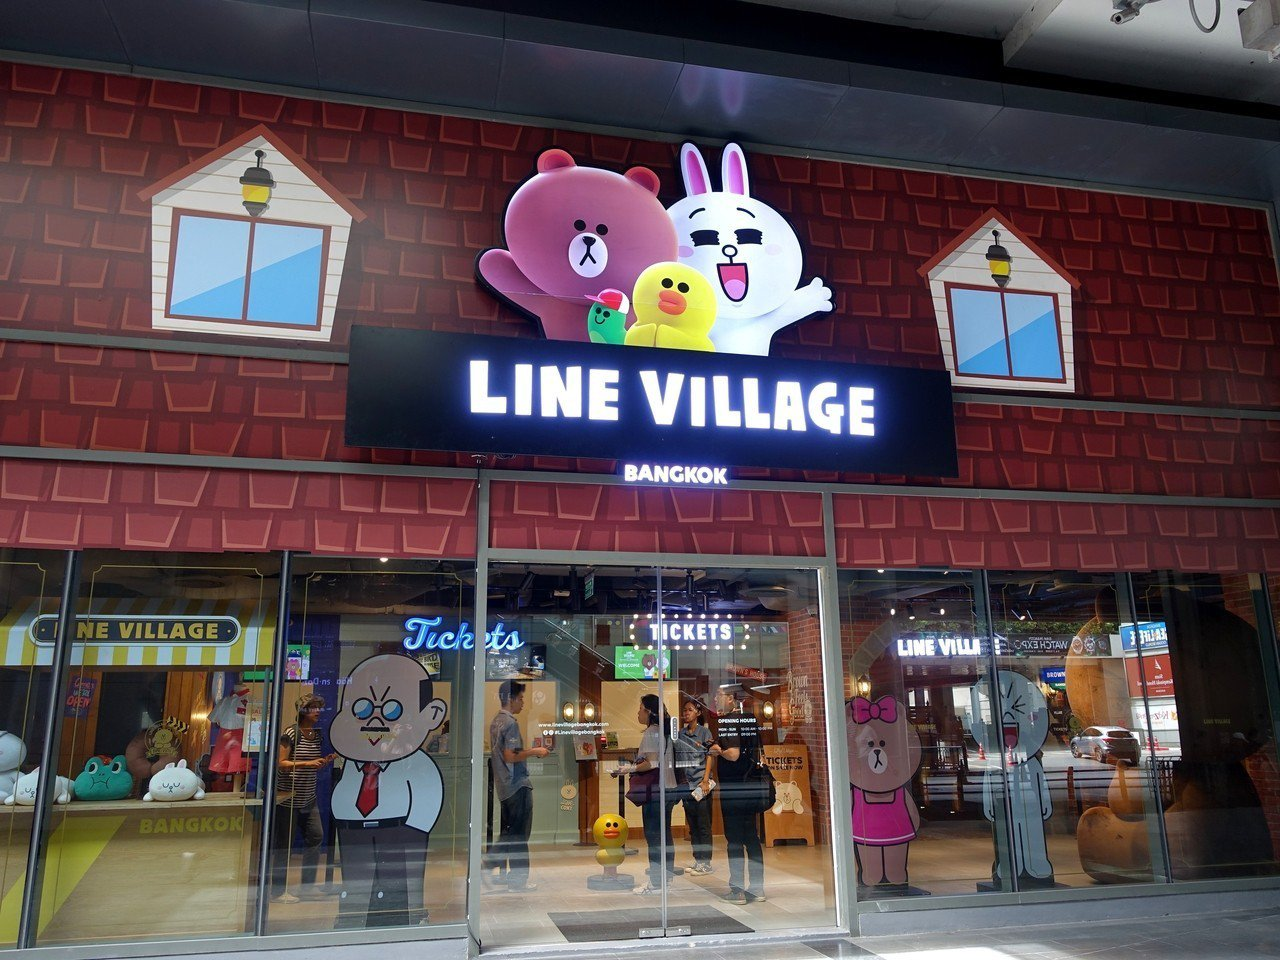 LINE VILLAGE就在Siam站4號出口。記者張芳瑜/攝影